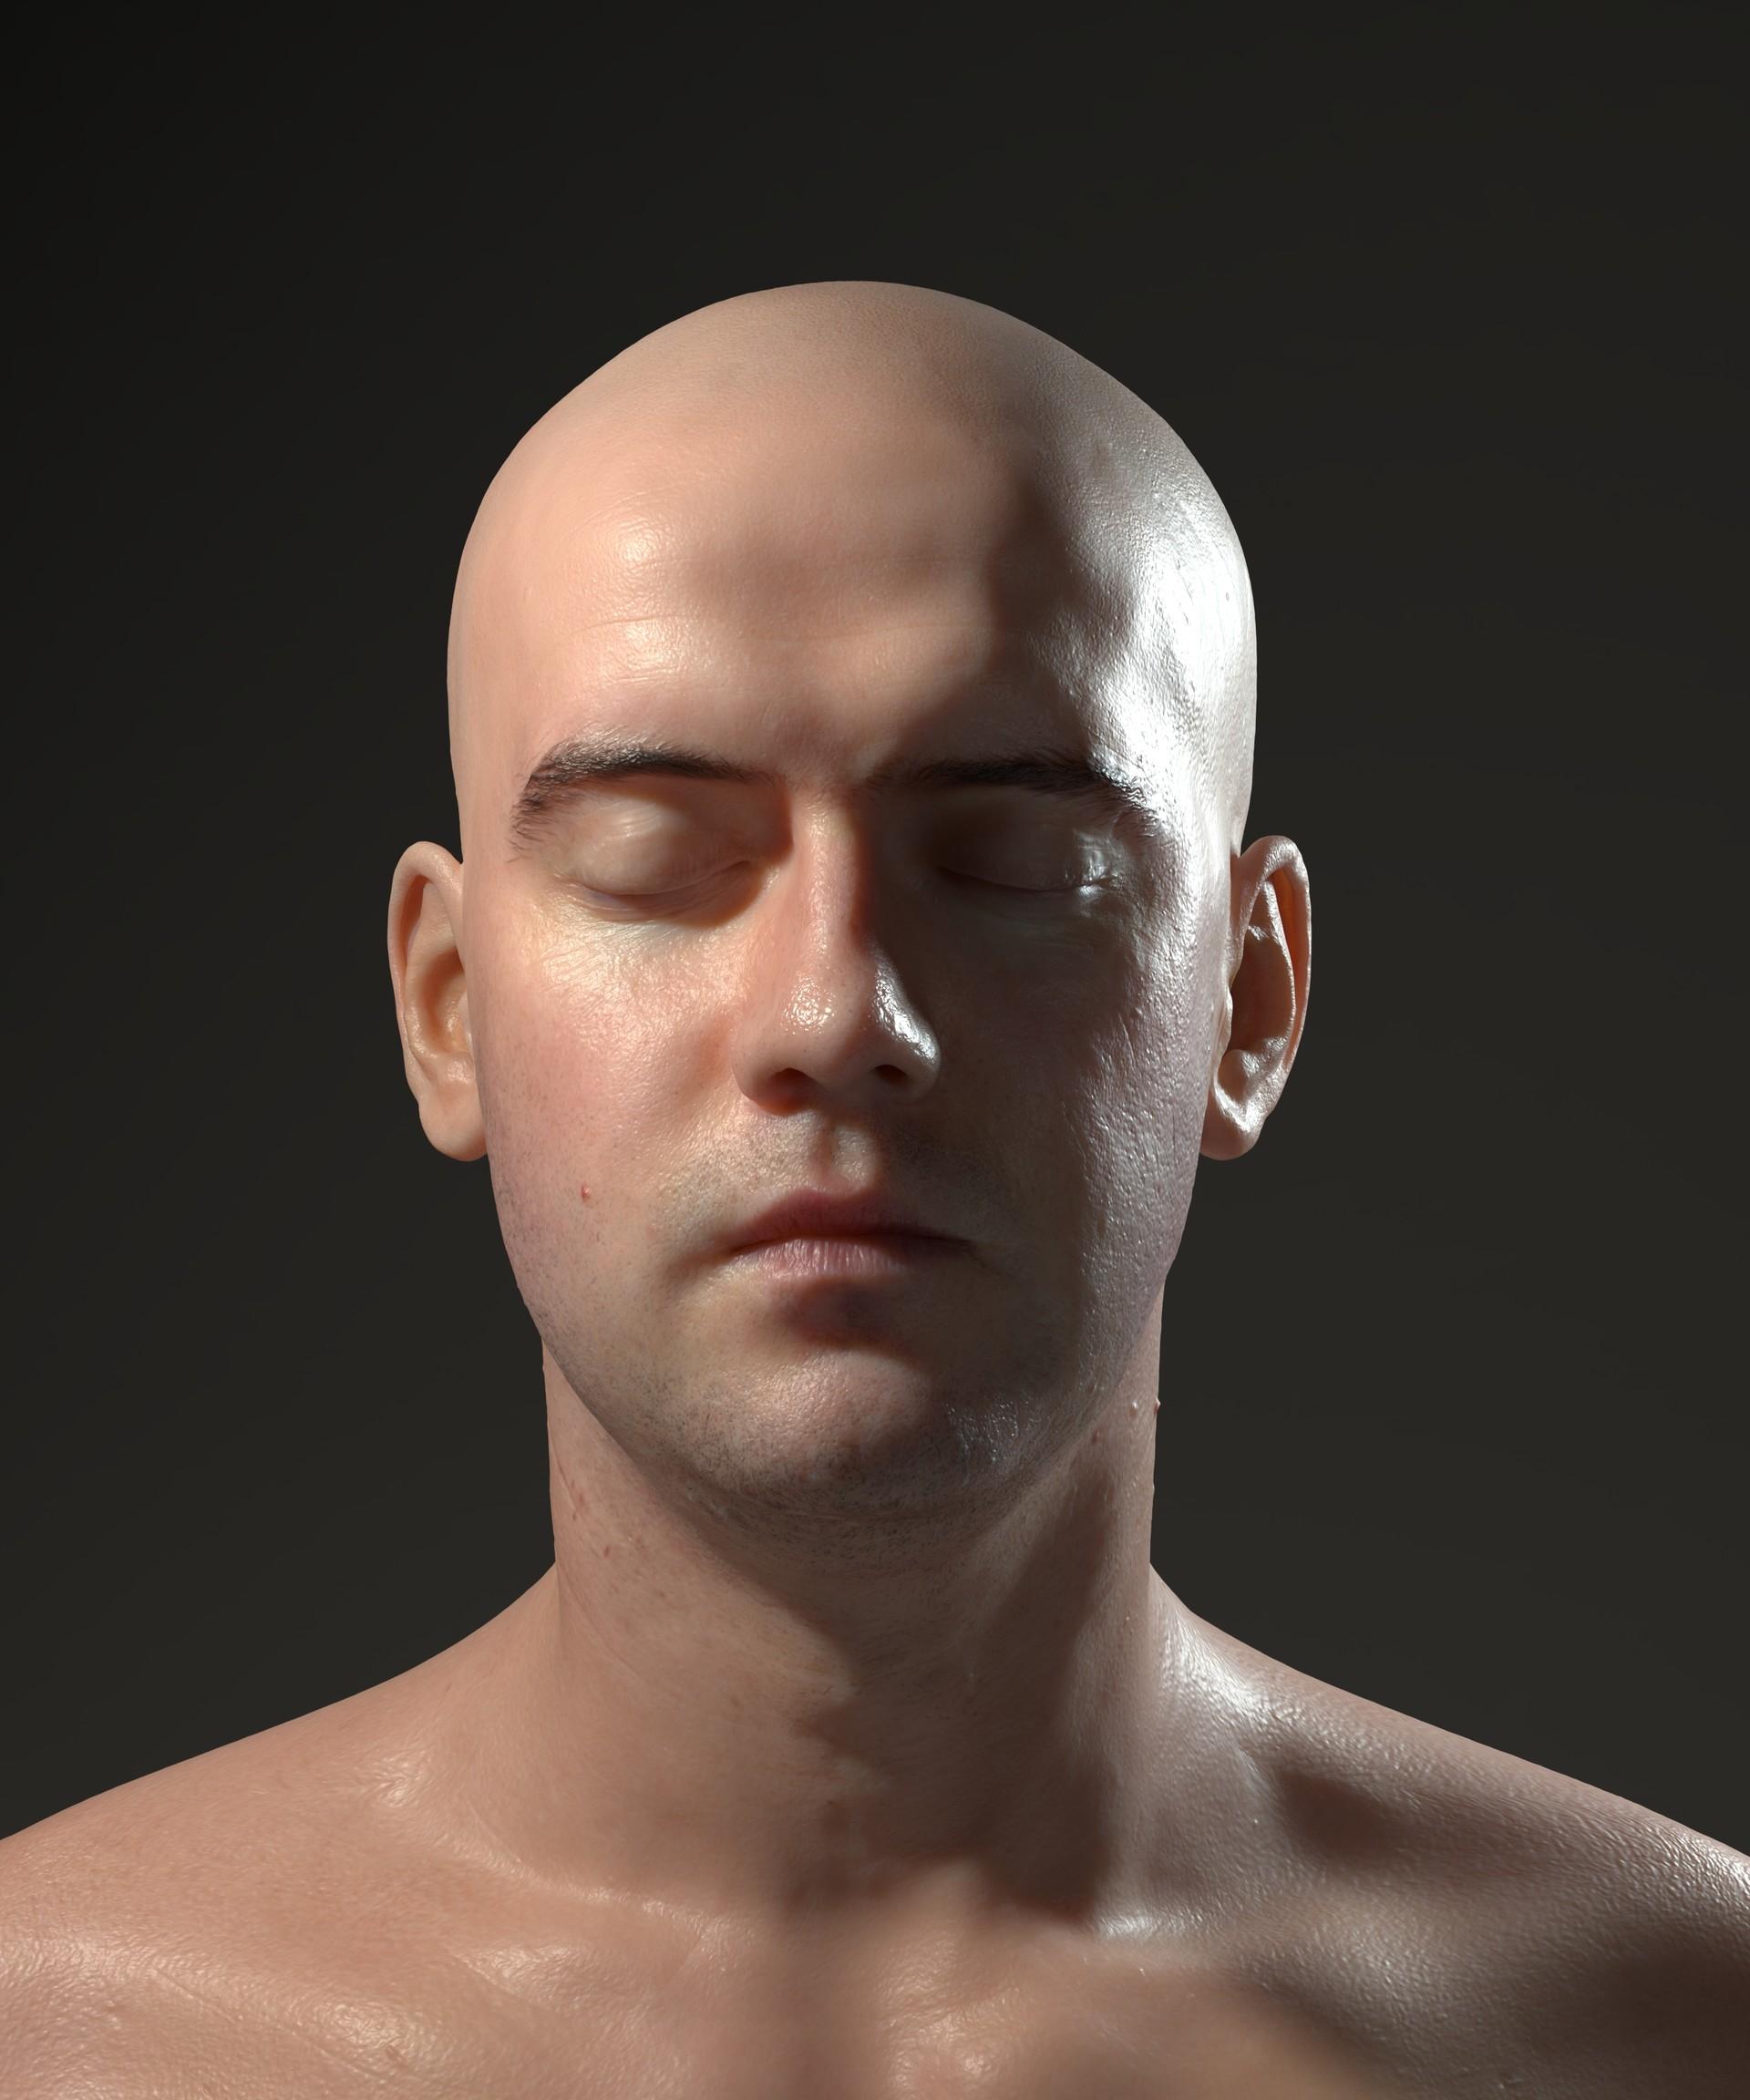 ArtStation - Realastic Skin Shader using RedShift & Maya